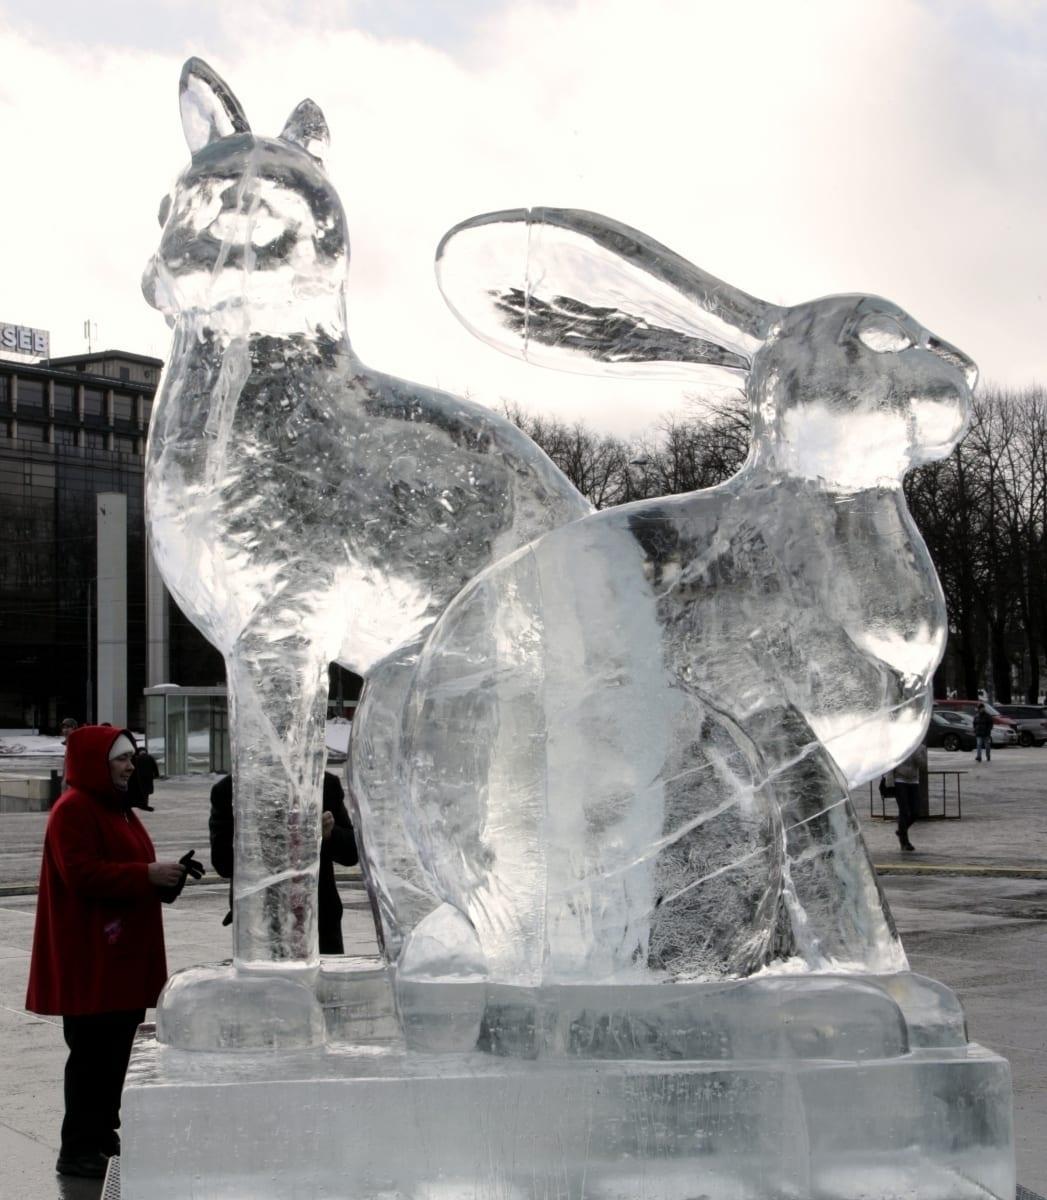 """JÄNES/KASS"" 2011 h= 2,5 m Tallinn, Eesti <br/> ""RABBIT/CAT"" 2011 h= 2,5 m Tallinn, Estonia"